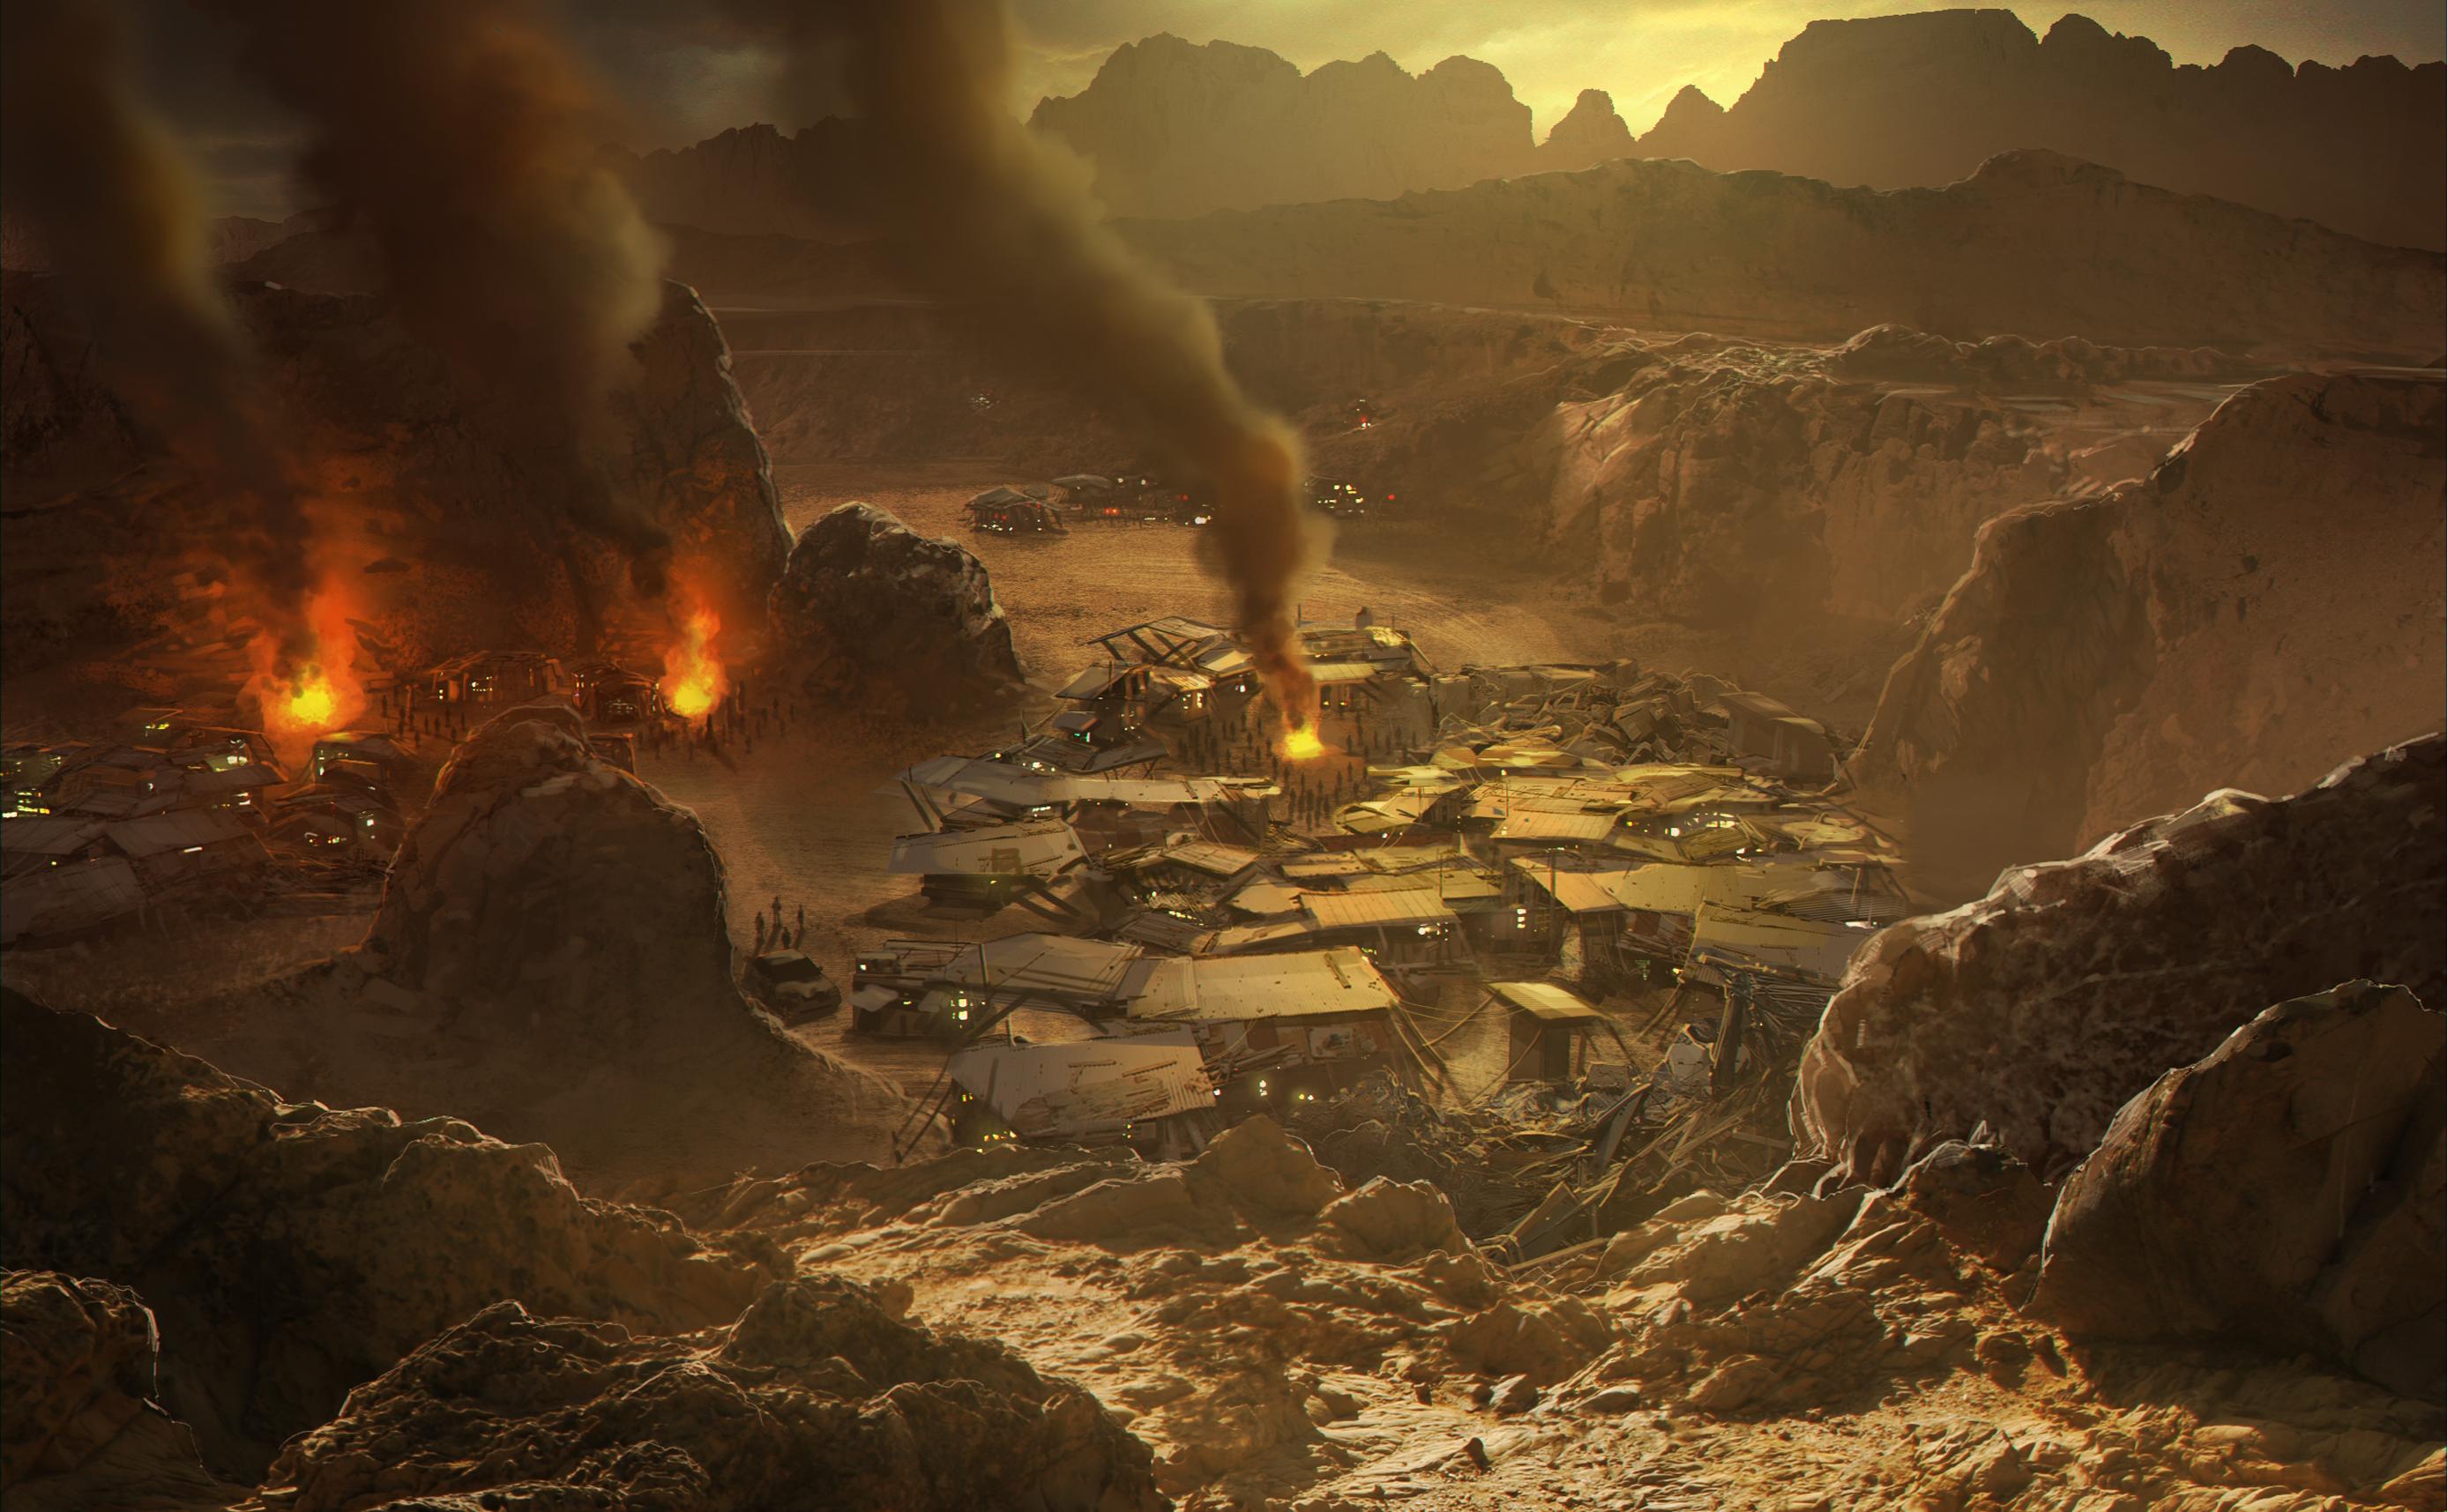 Video Game - Red Faction: Armageddon Wallpaper